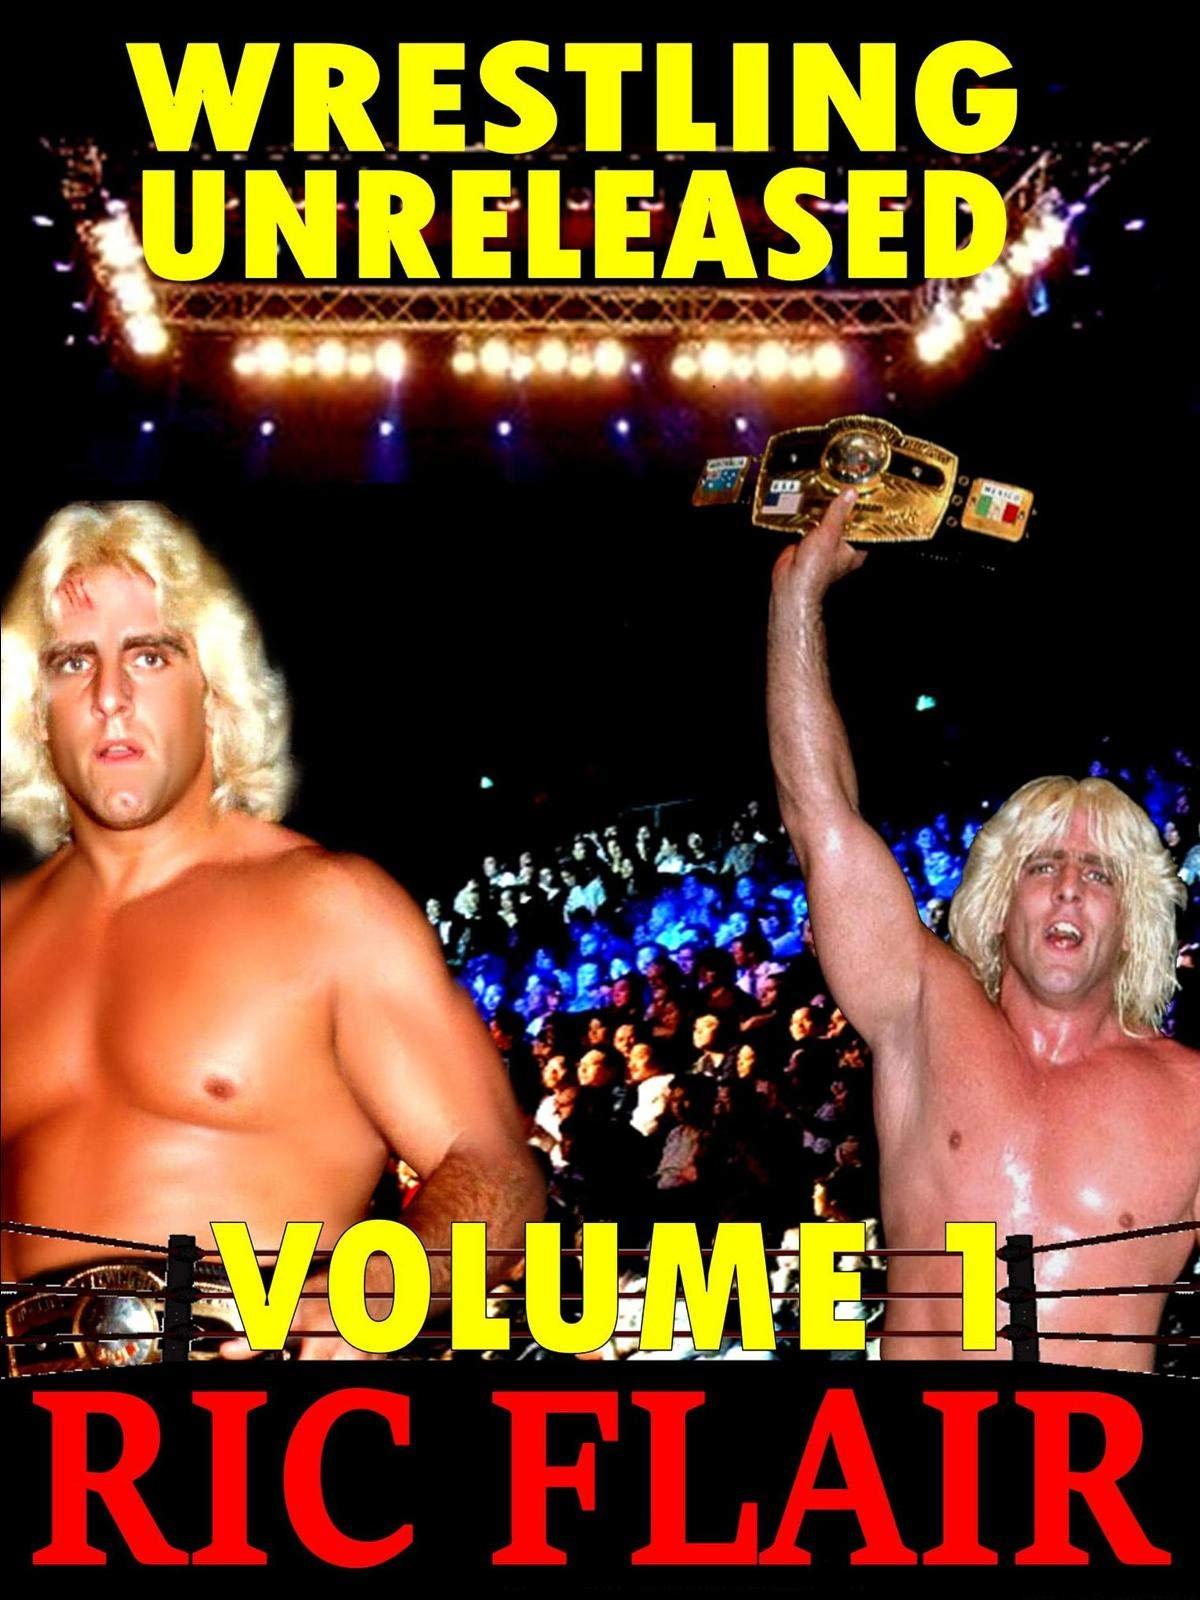 Ric Flair: Wrestling Unreleased on Amazon Prime Video UK